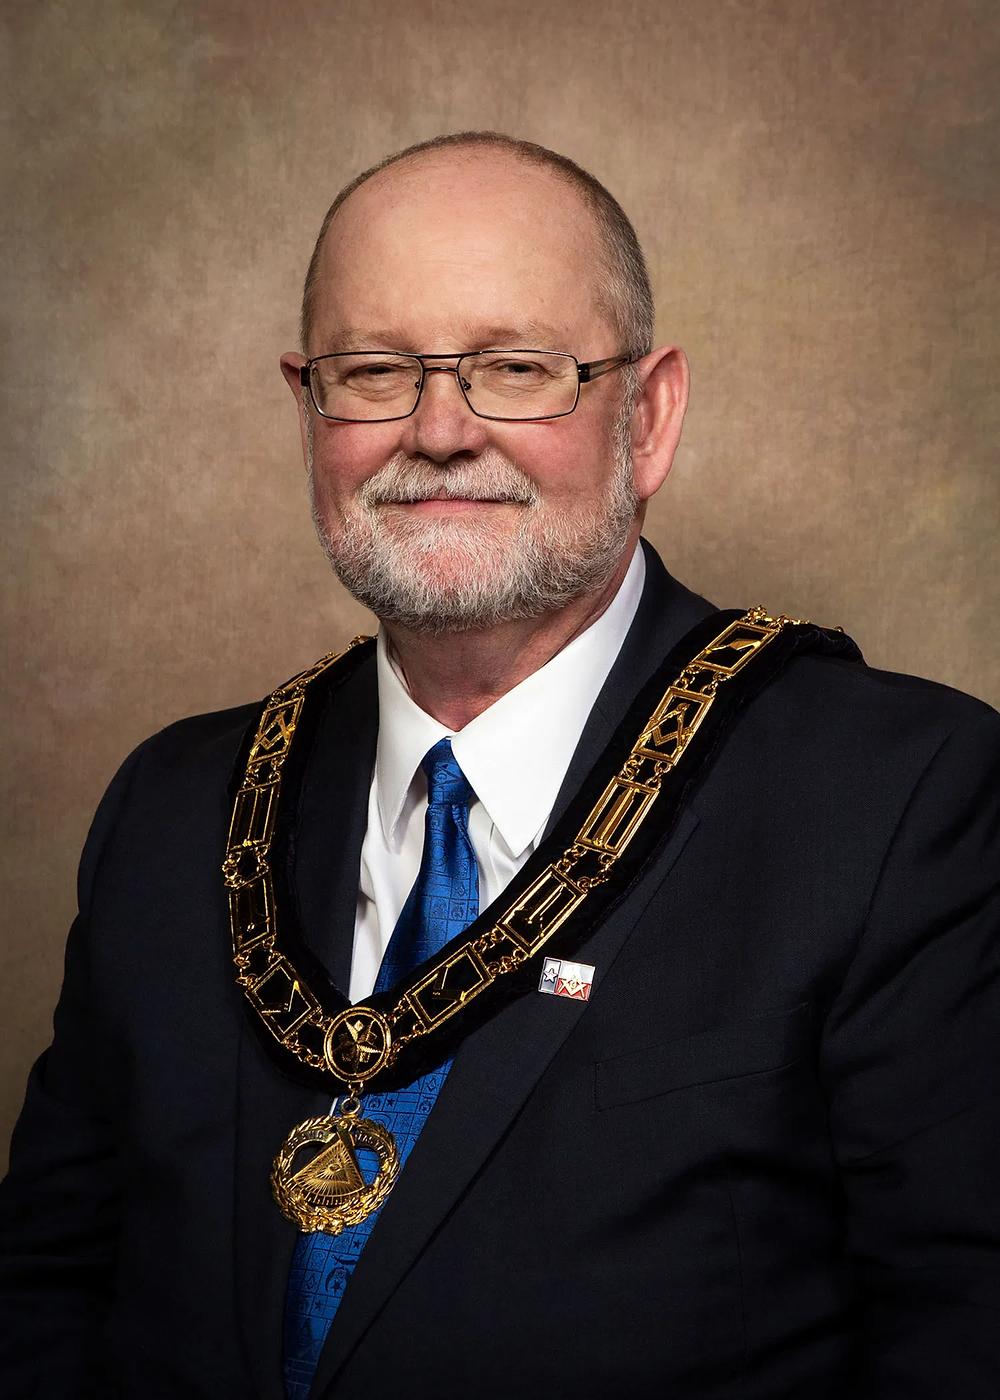 Freemasonry - Paul D. Underwood - Grand Master